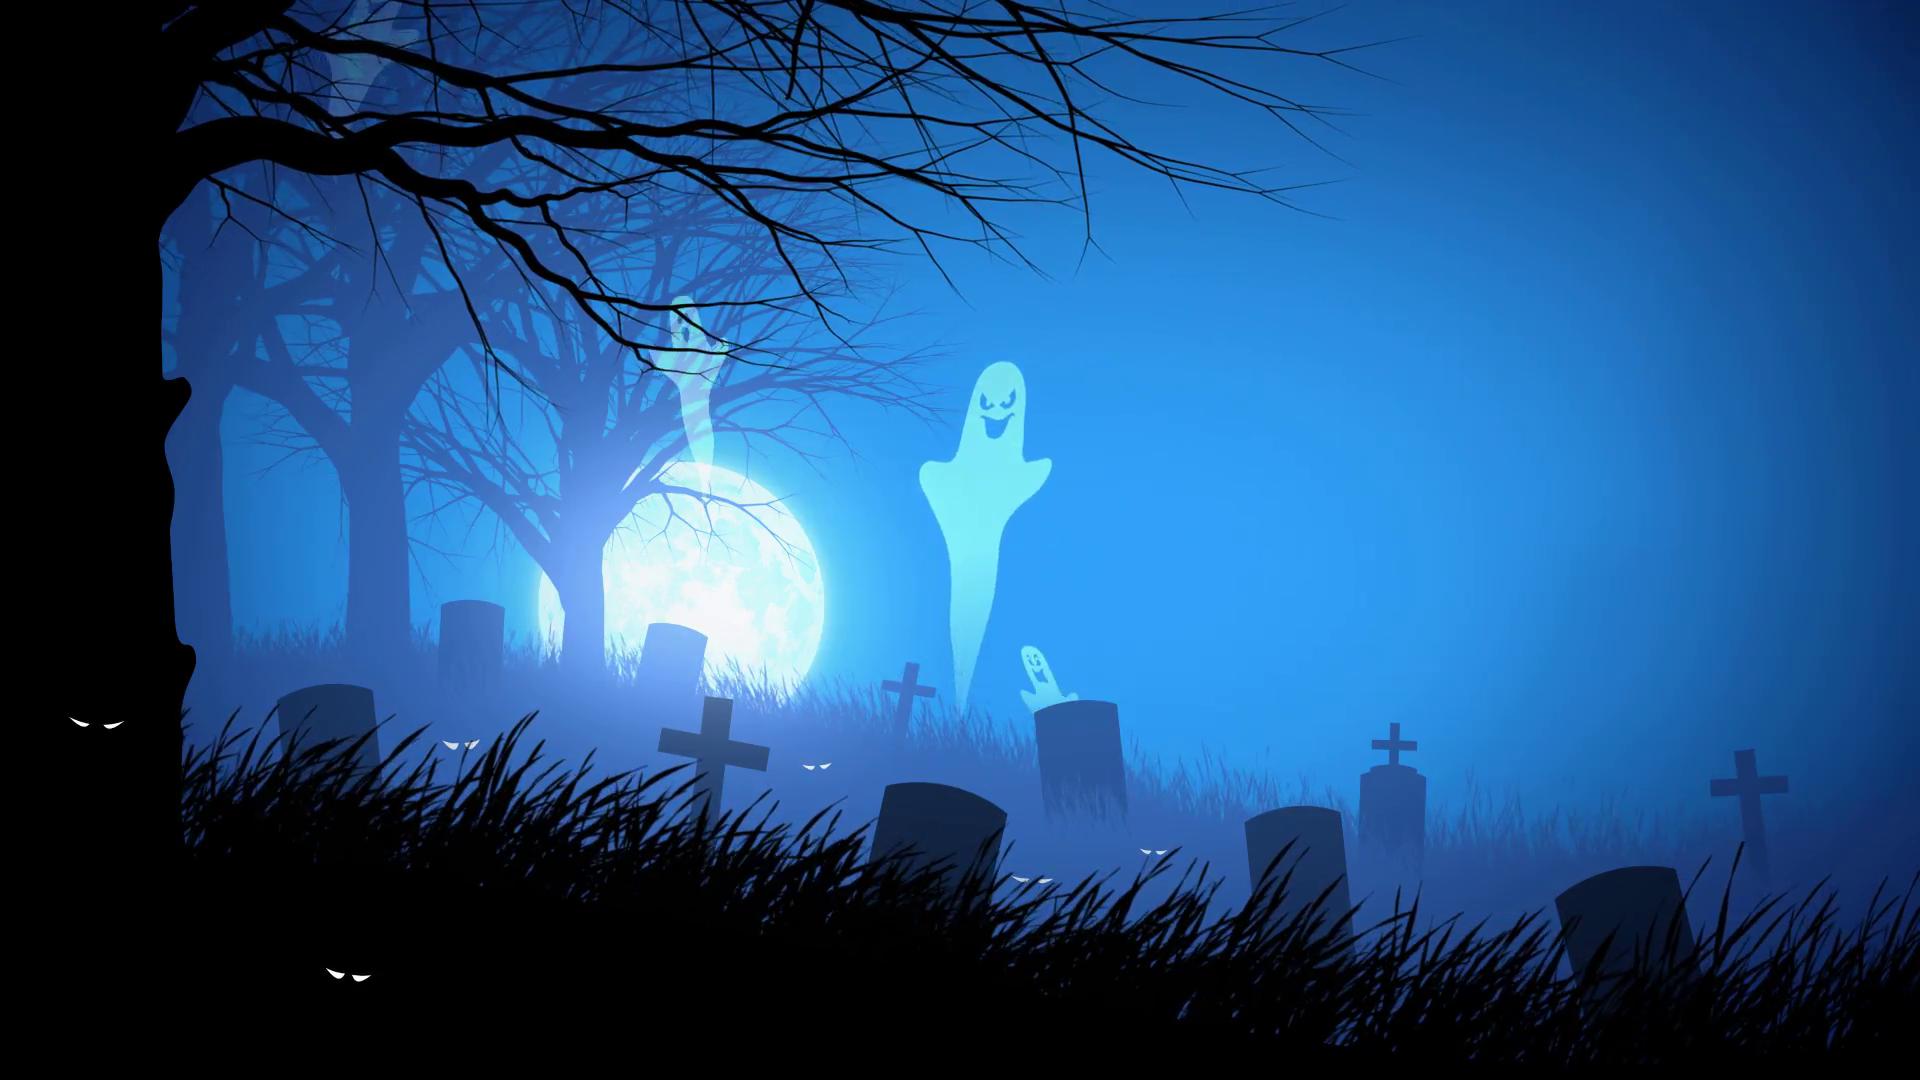 Halloween Background Halloween Backgrounds Halloween Flyer